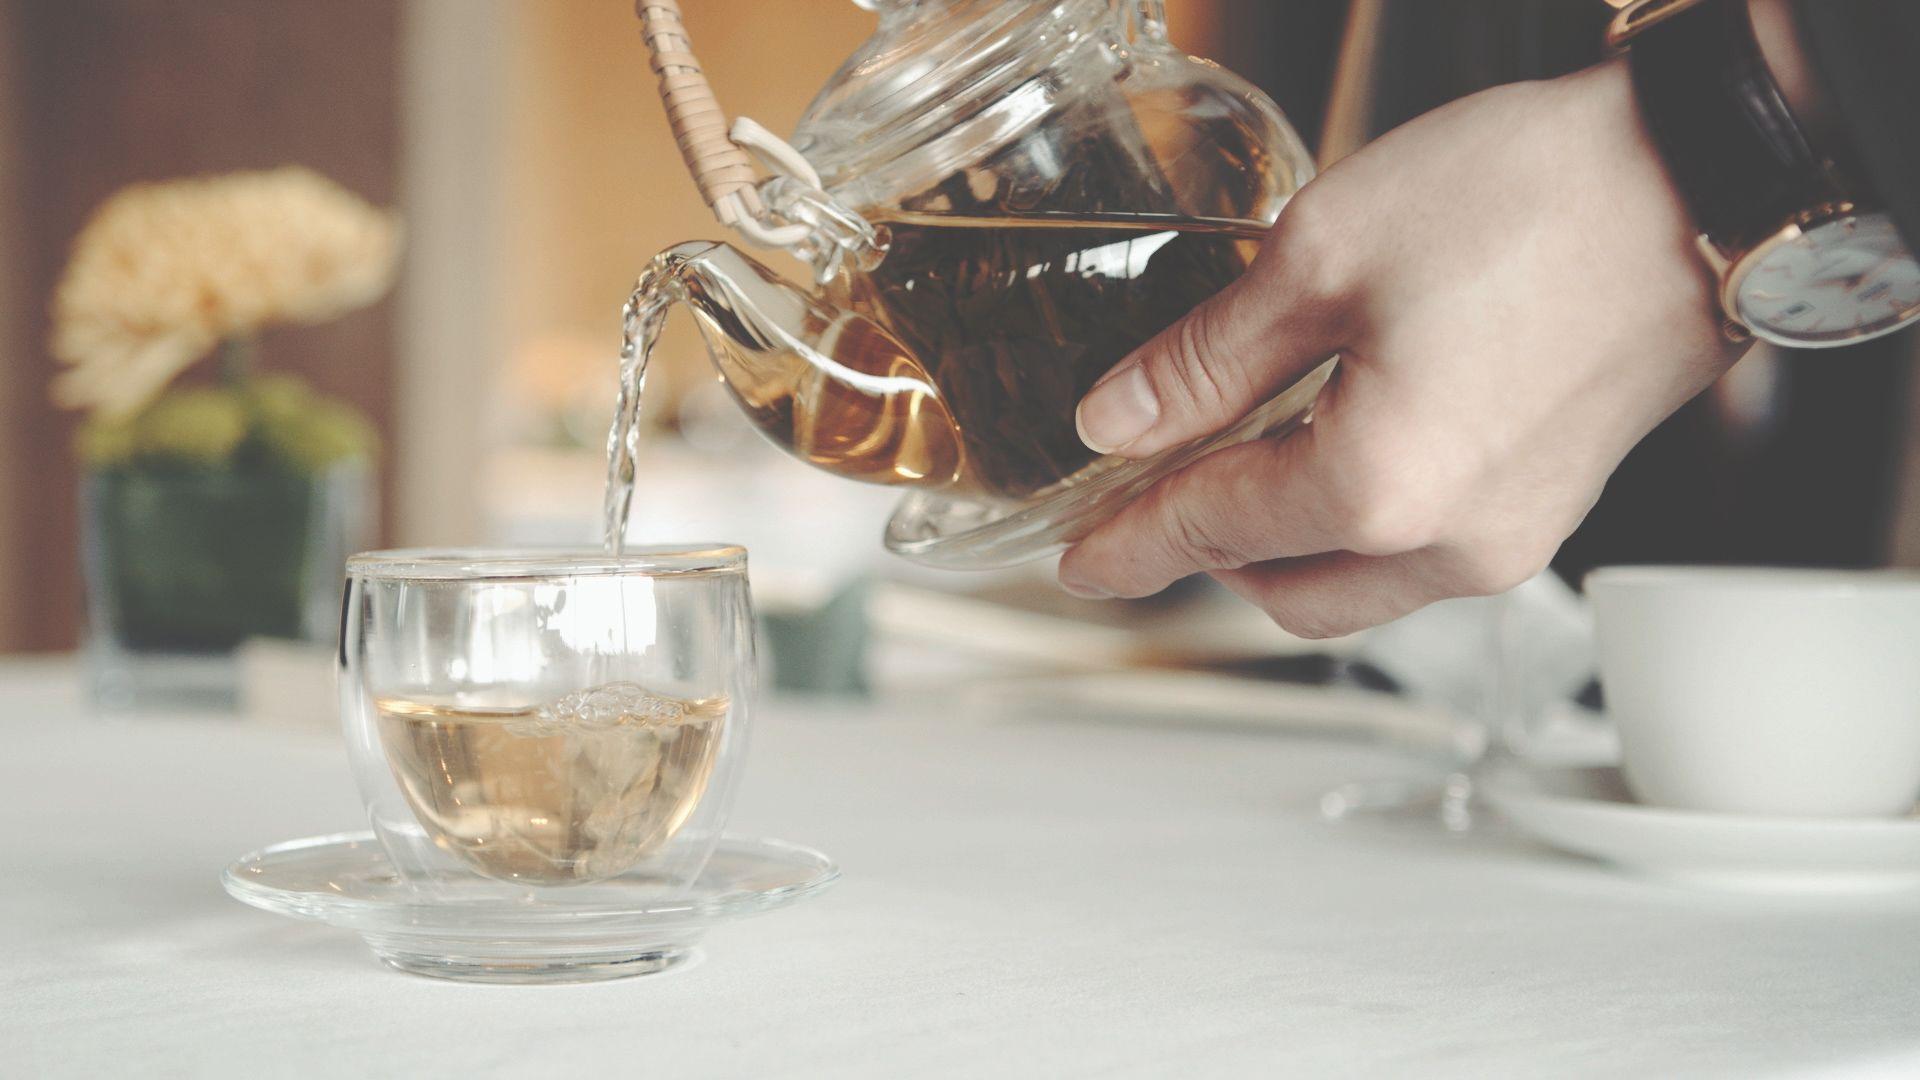 INTERCONTINENTAL HOTEL - THE TEA SOMMELIER